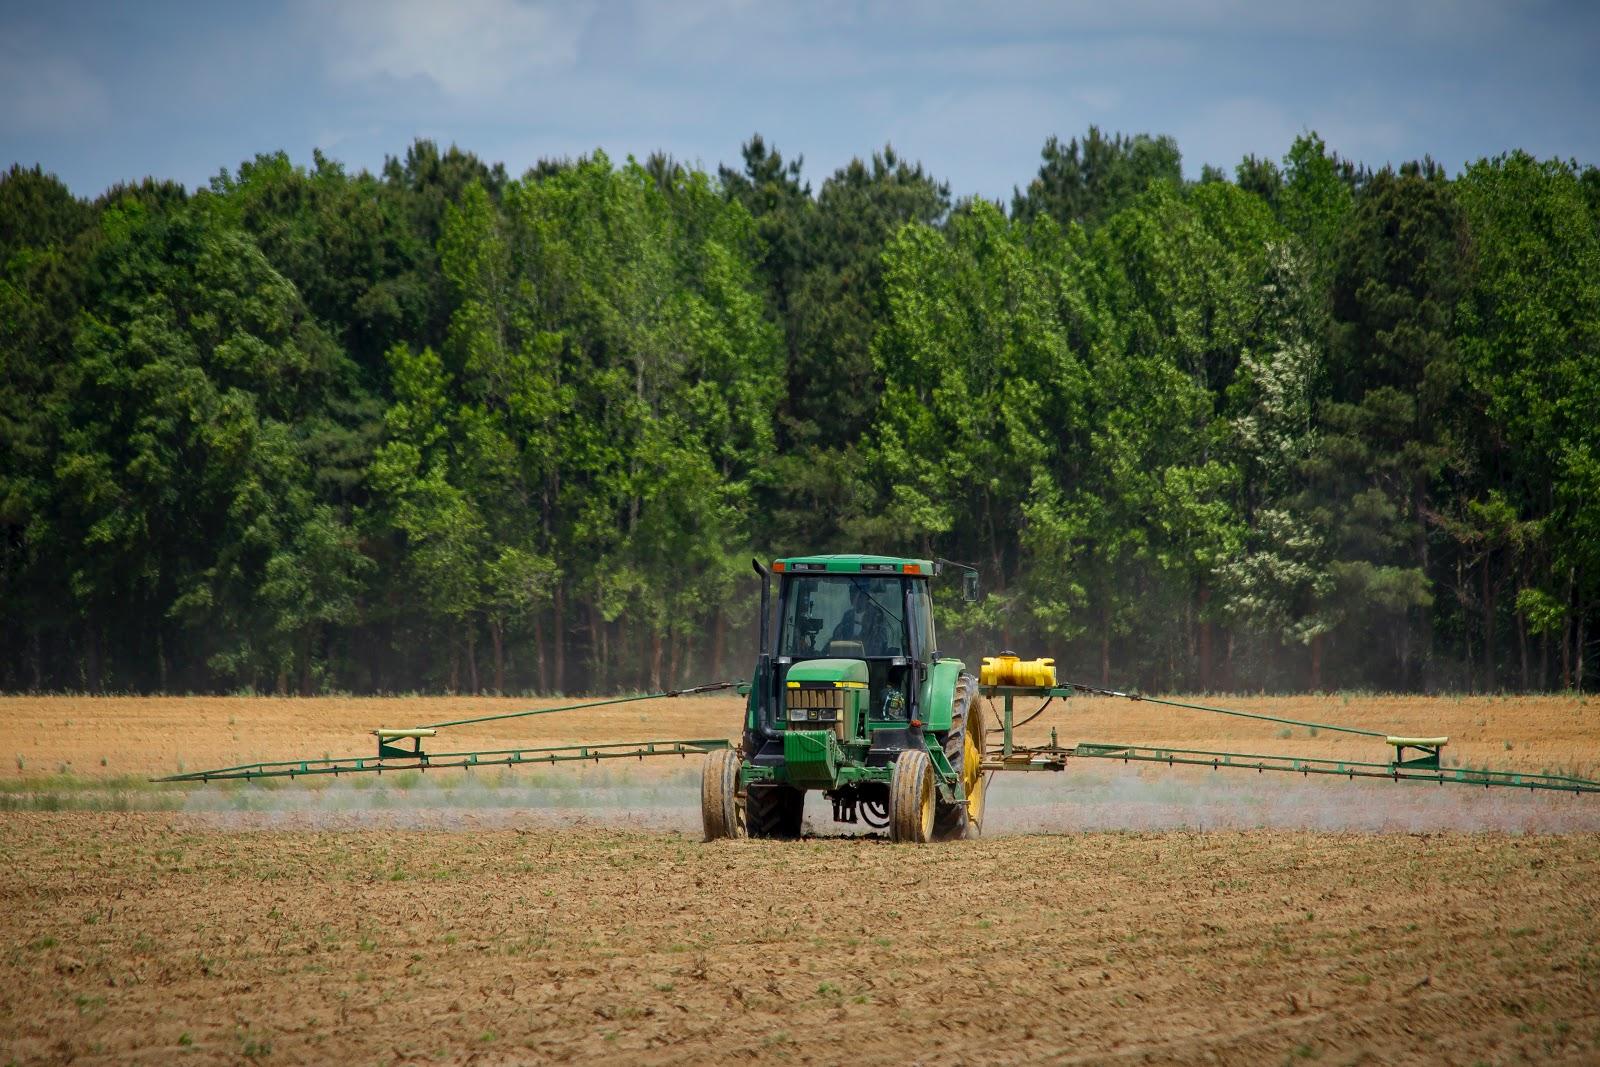 farmer spraying his crop field